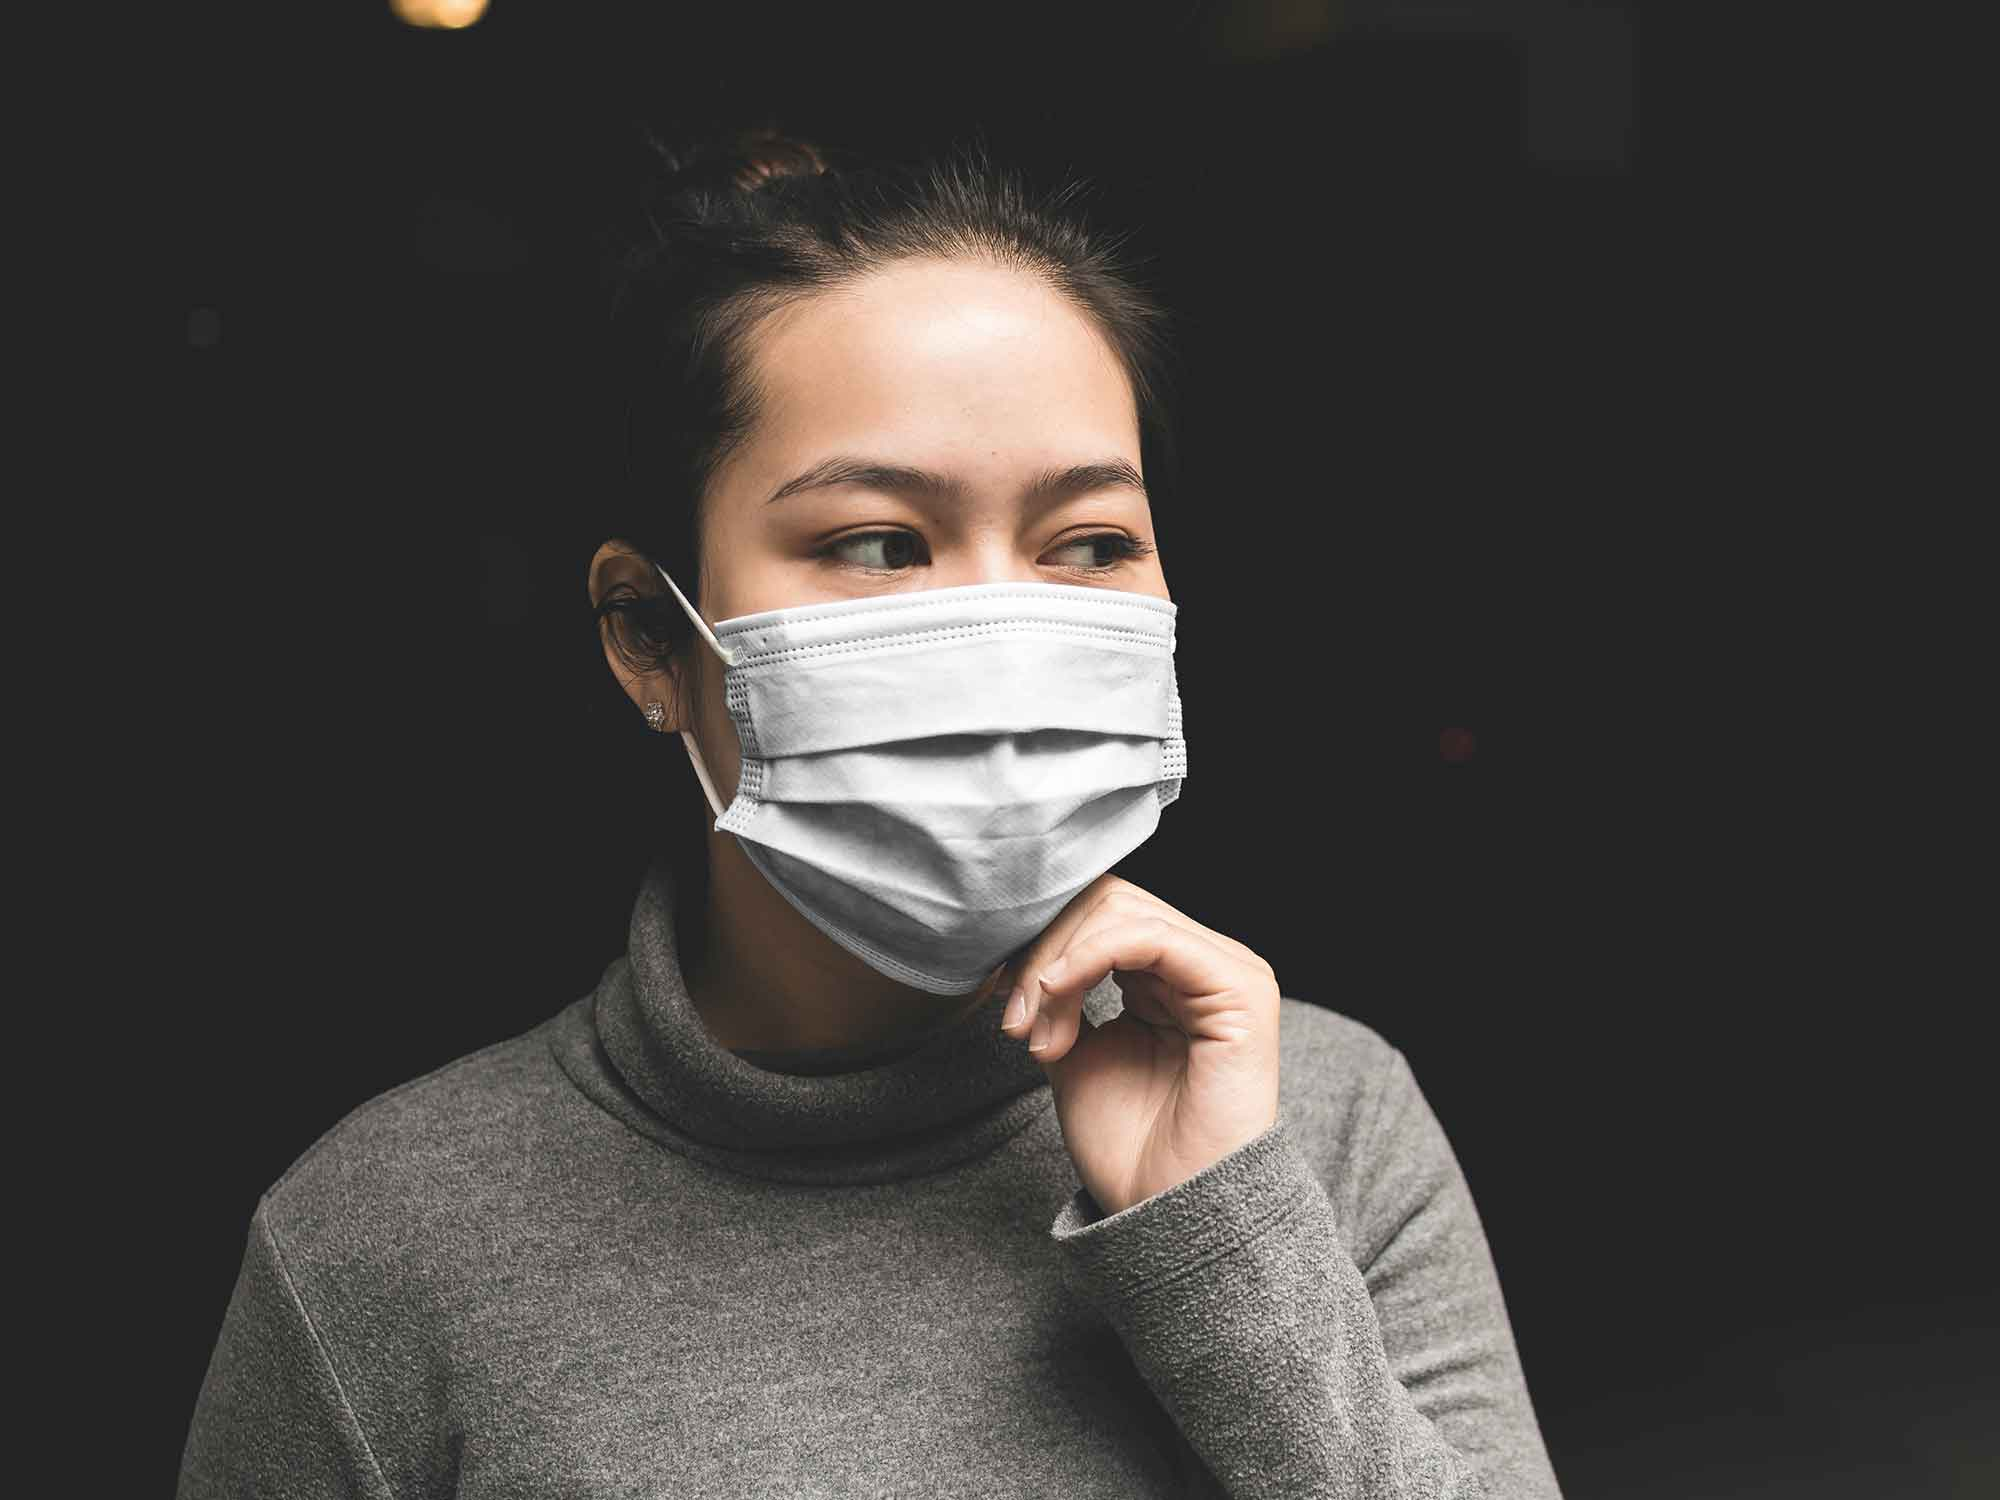 Women Face Mask Mockup 2